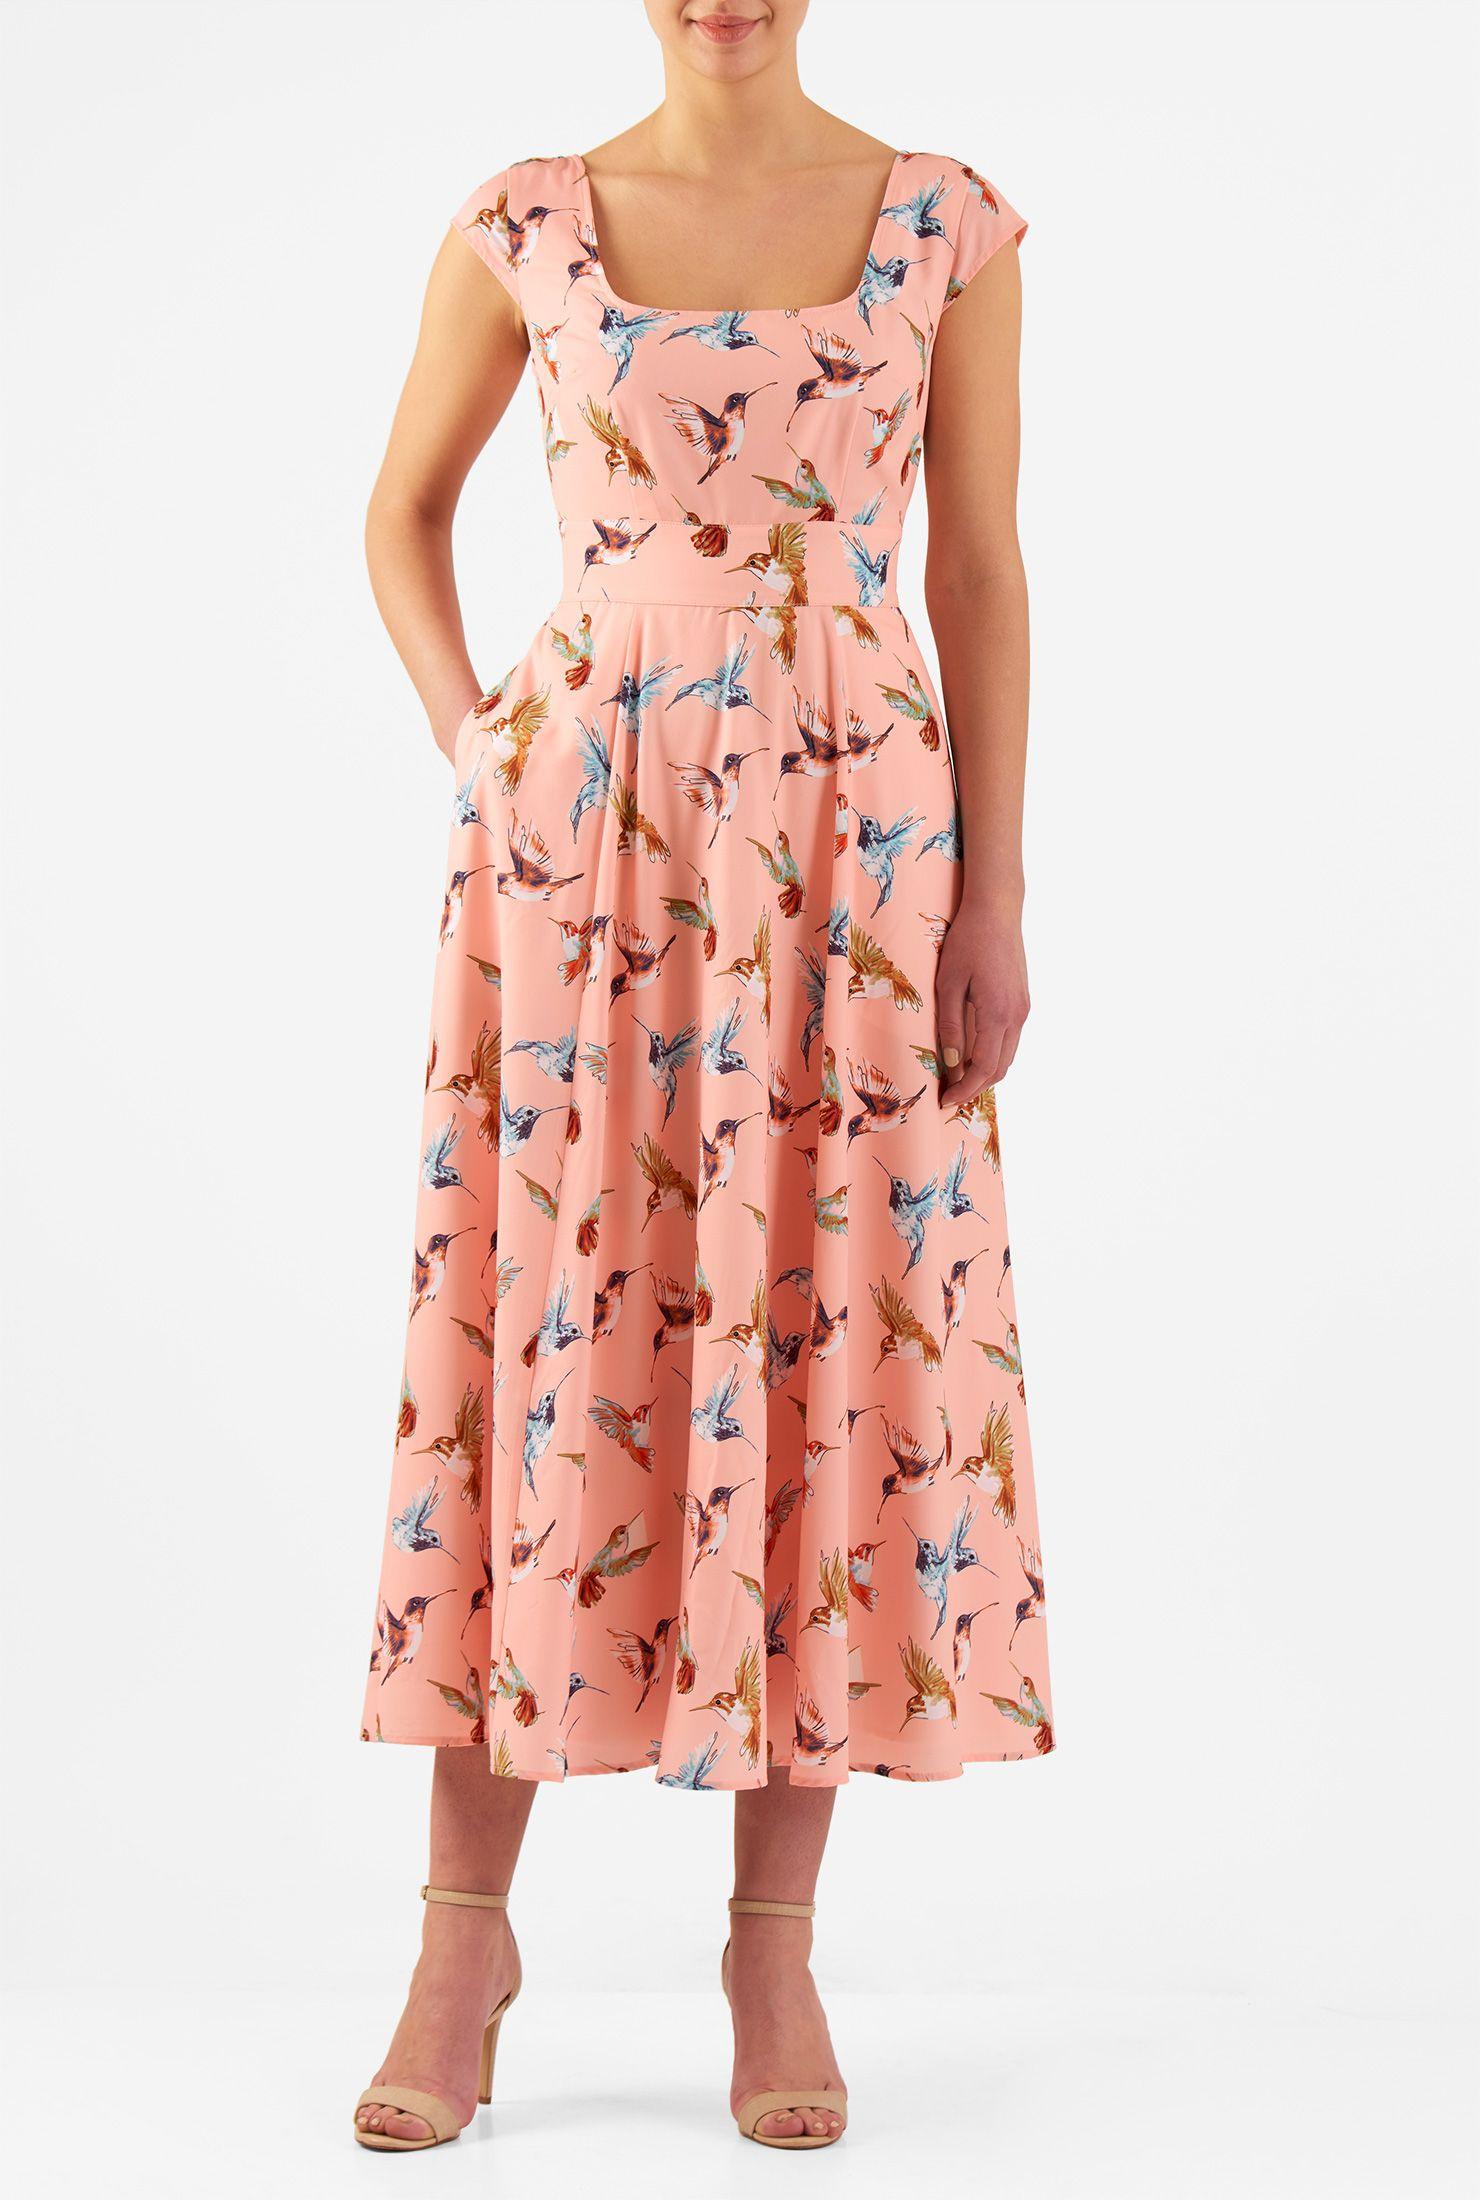 Valerie dress midi dresses crepes and printing